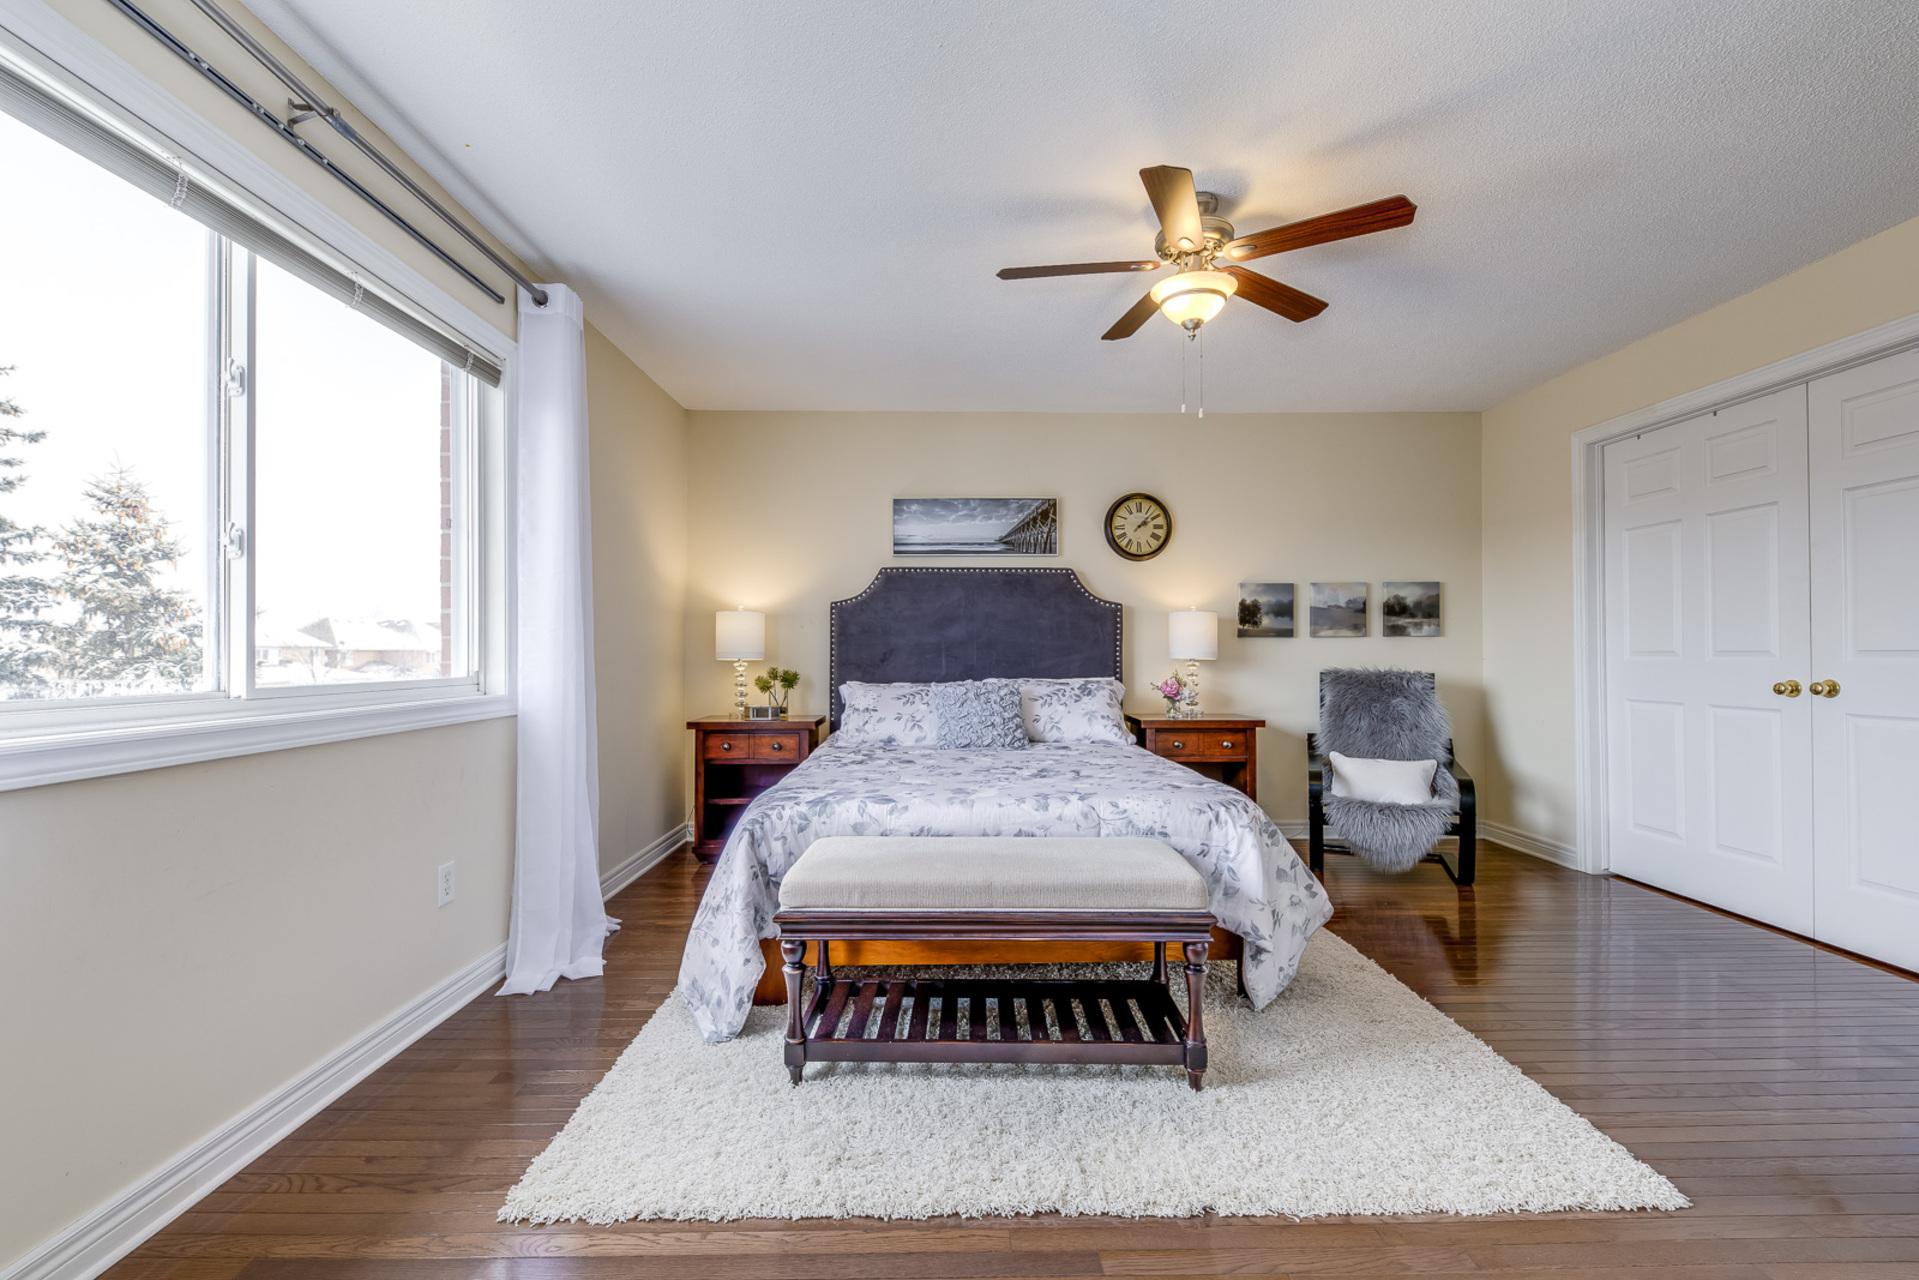 Master Bedroom - 1418 Gulledge Tr, Oakville - Elite3 & Team at 1418 Gulledge Trail, West Oak Trails, Oakville